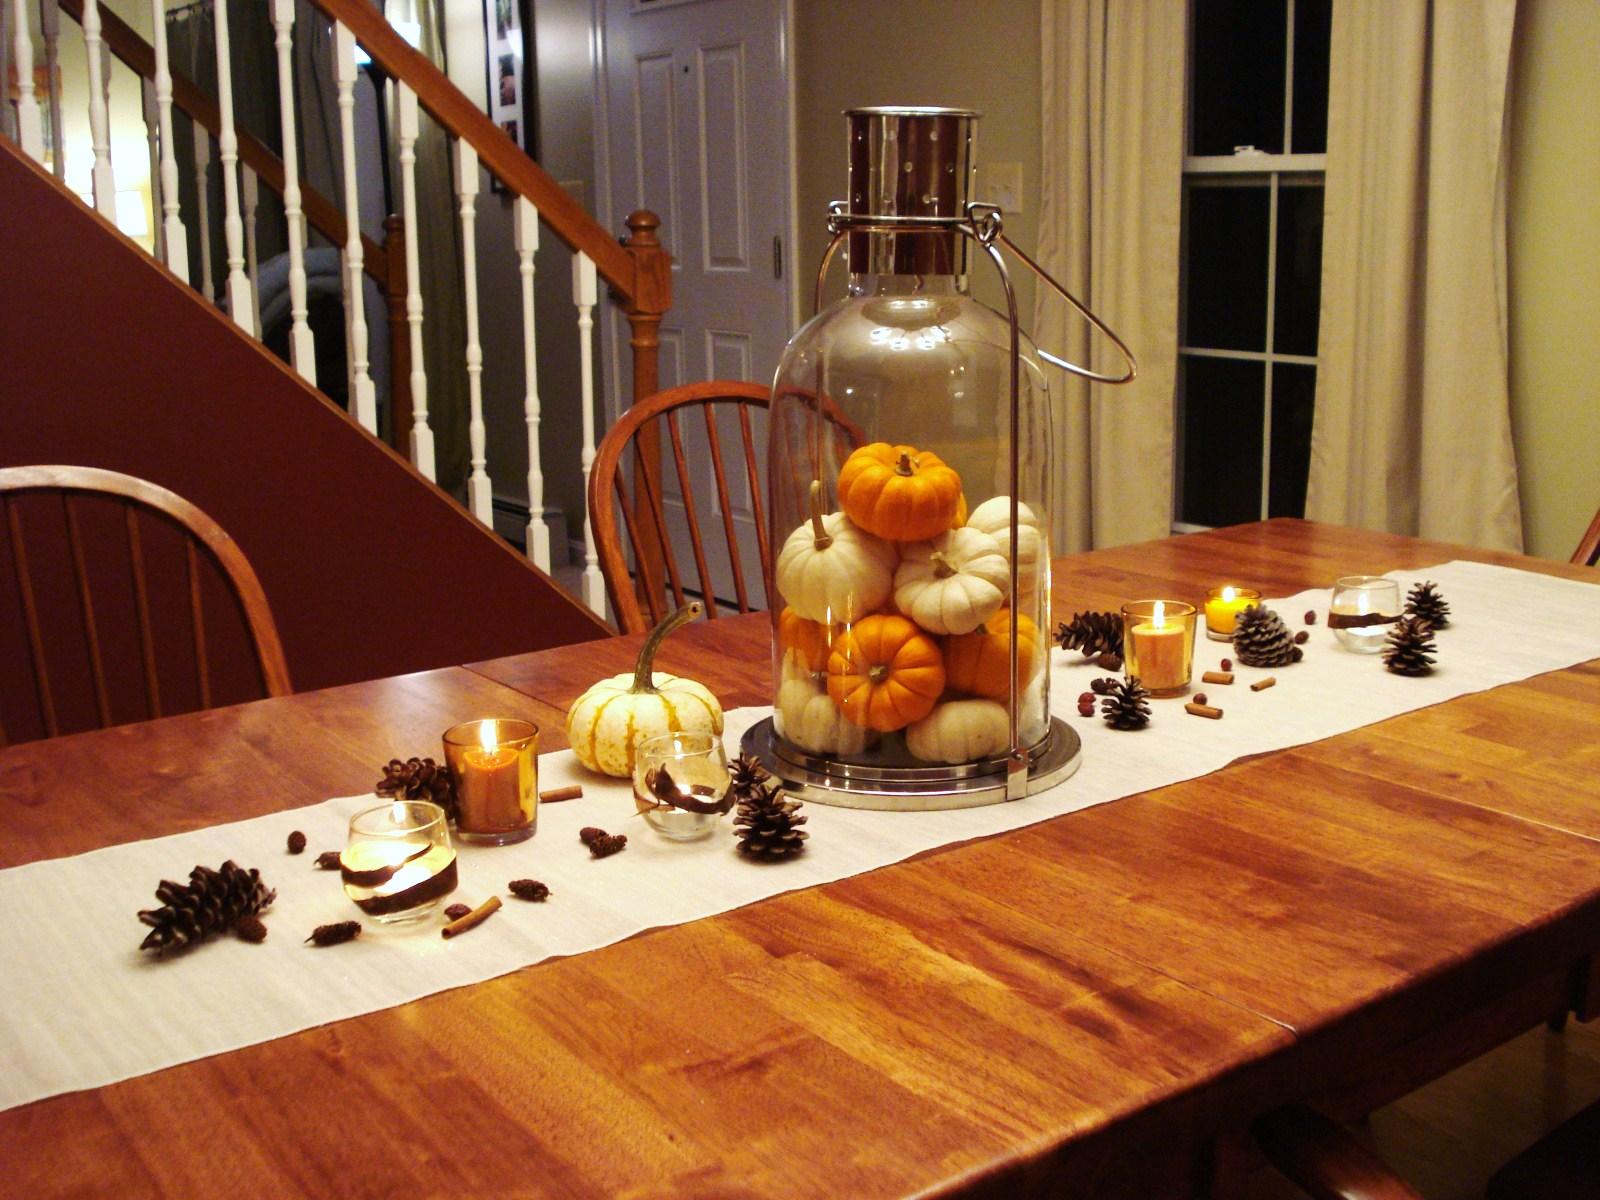 Dining Room Table Centerpiece Ideas Unique: Heart Maine Home: A Cozy Fall Centerpiece